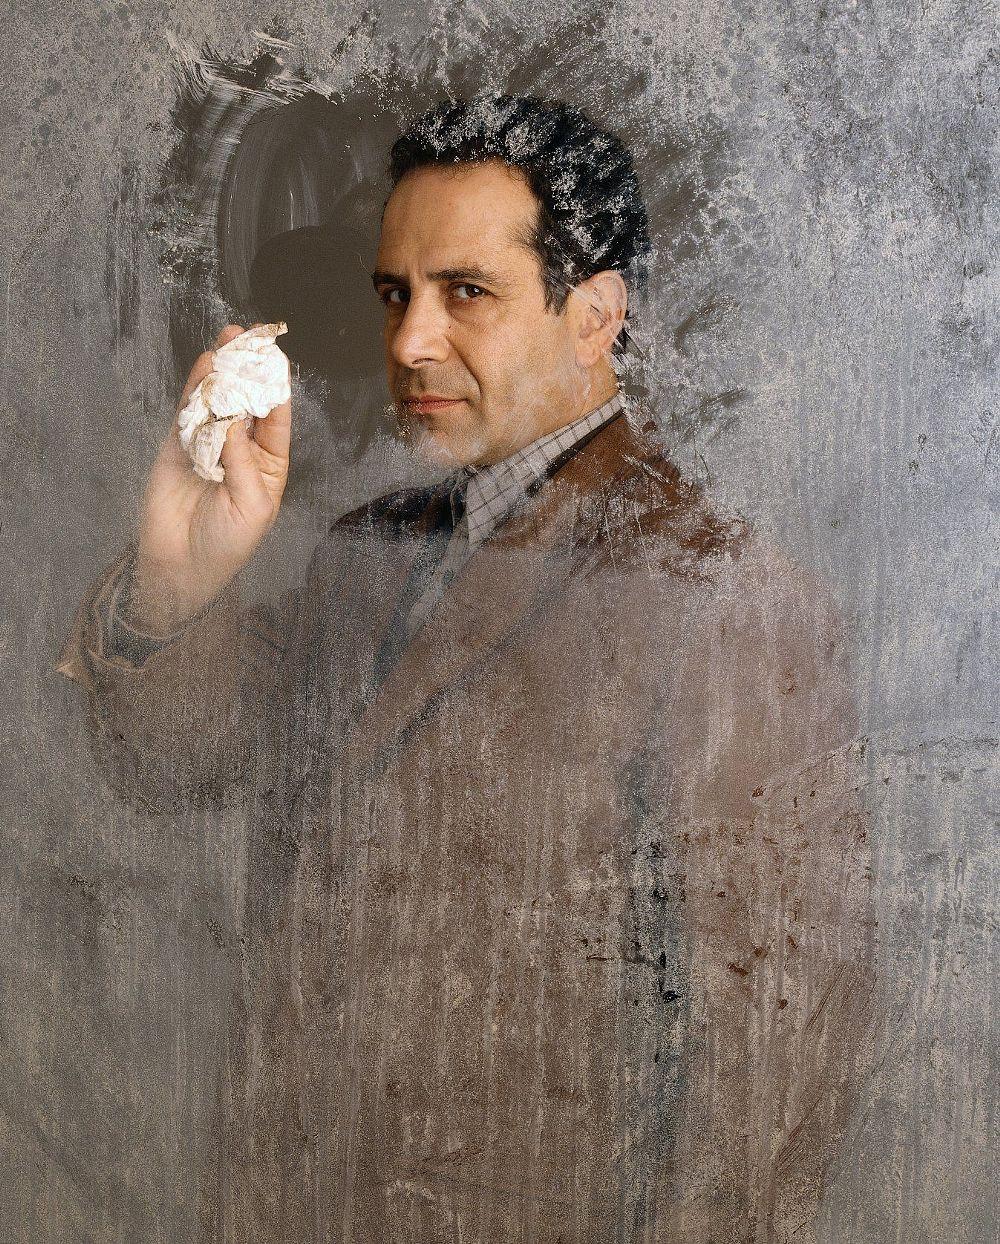 tony shalhoub detective series - 738×920